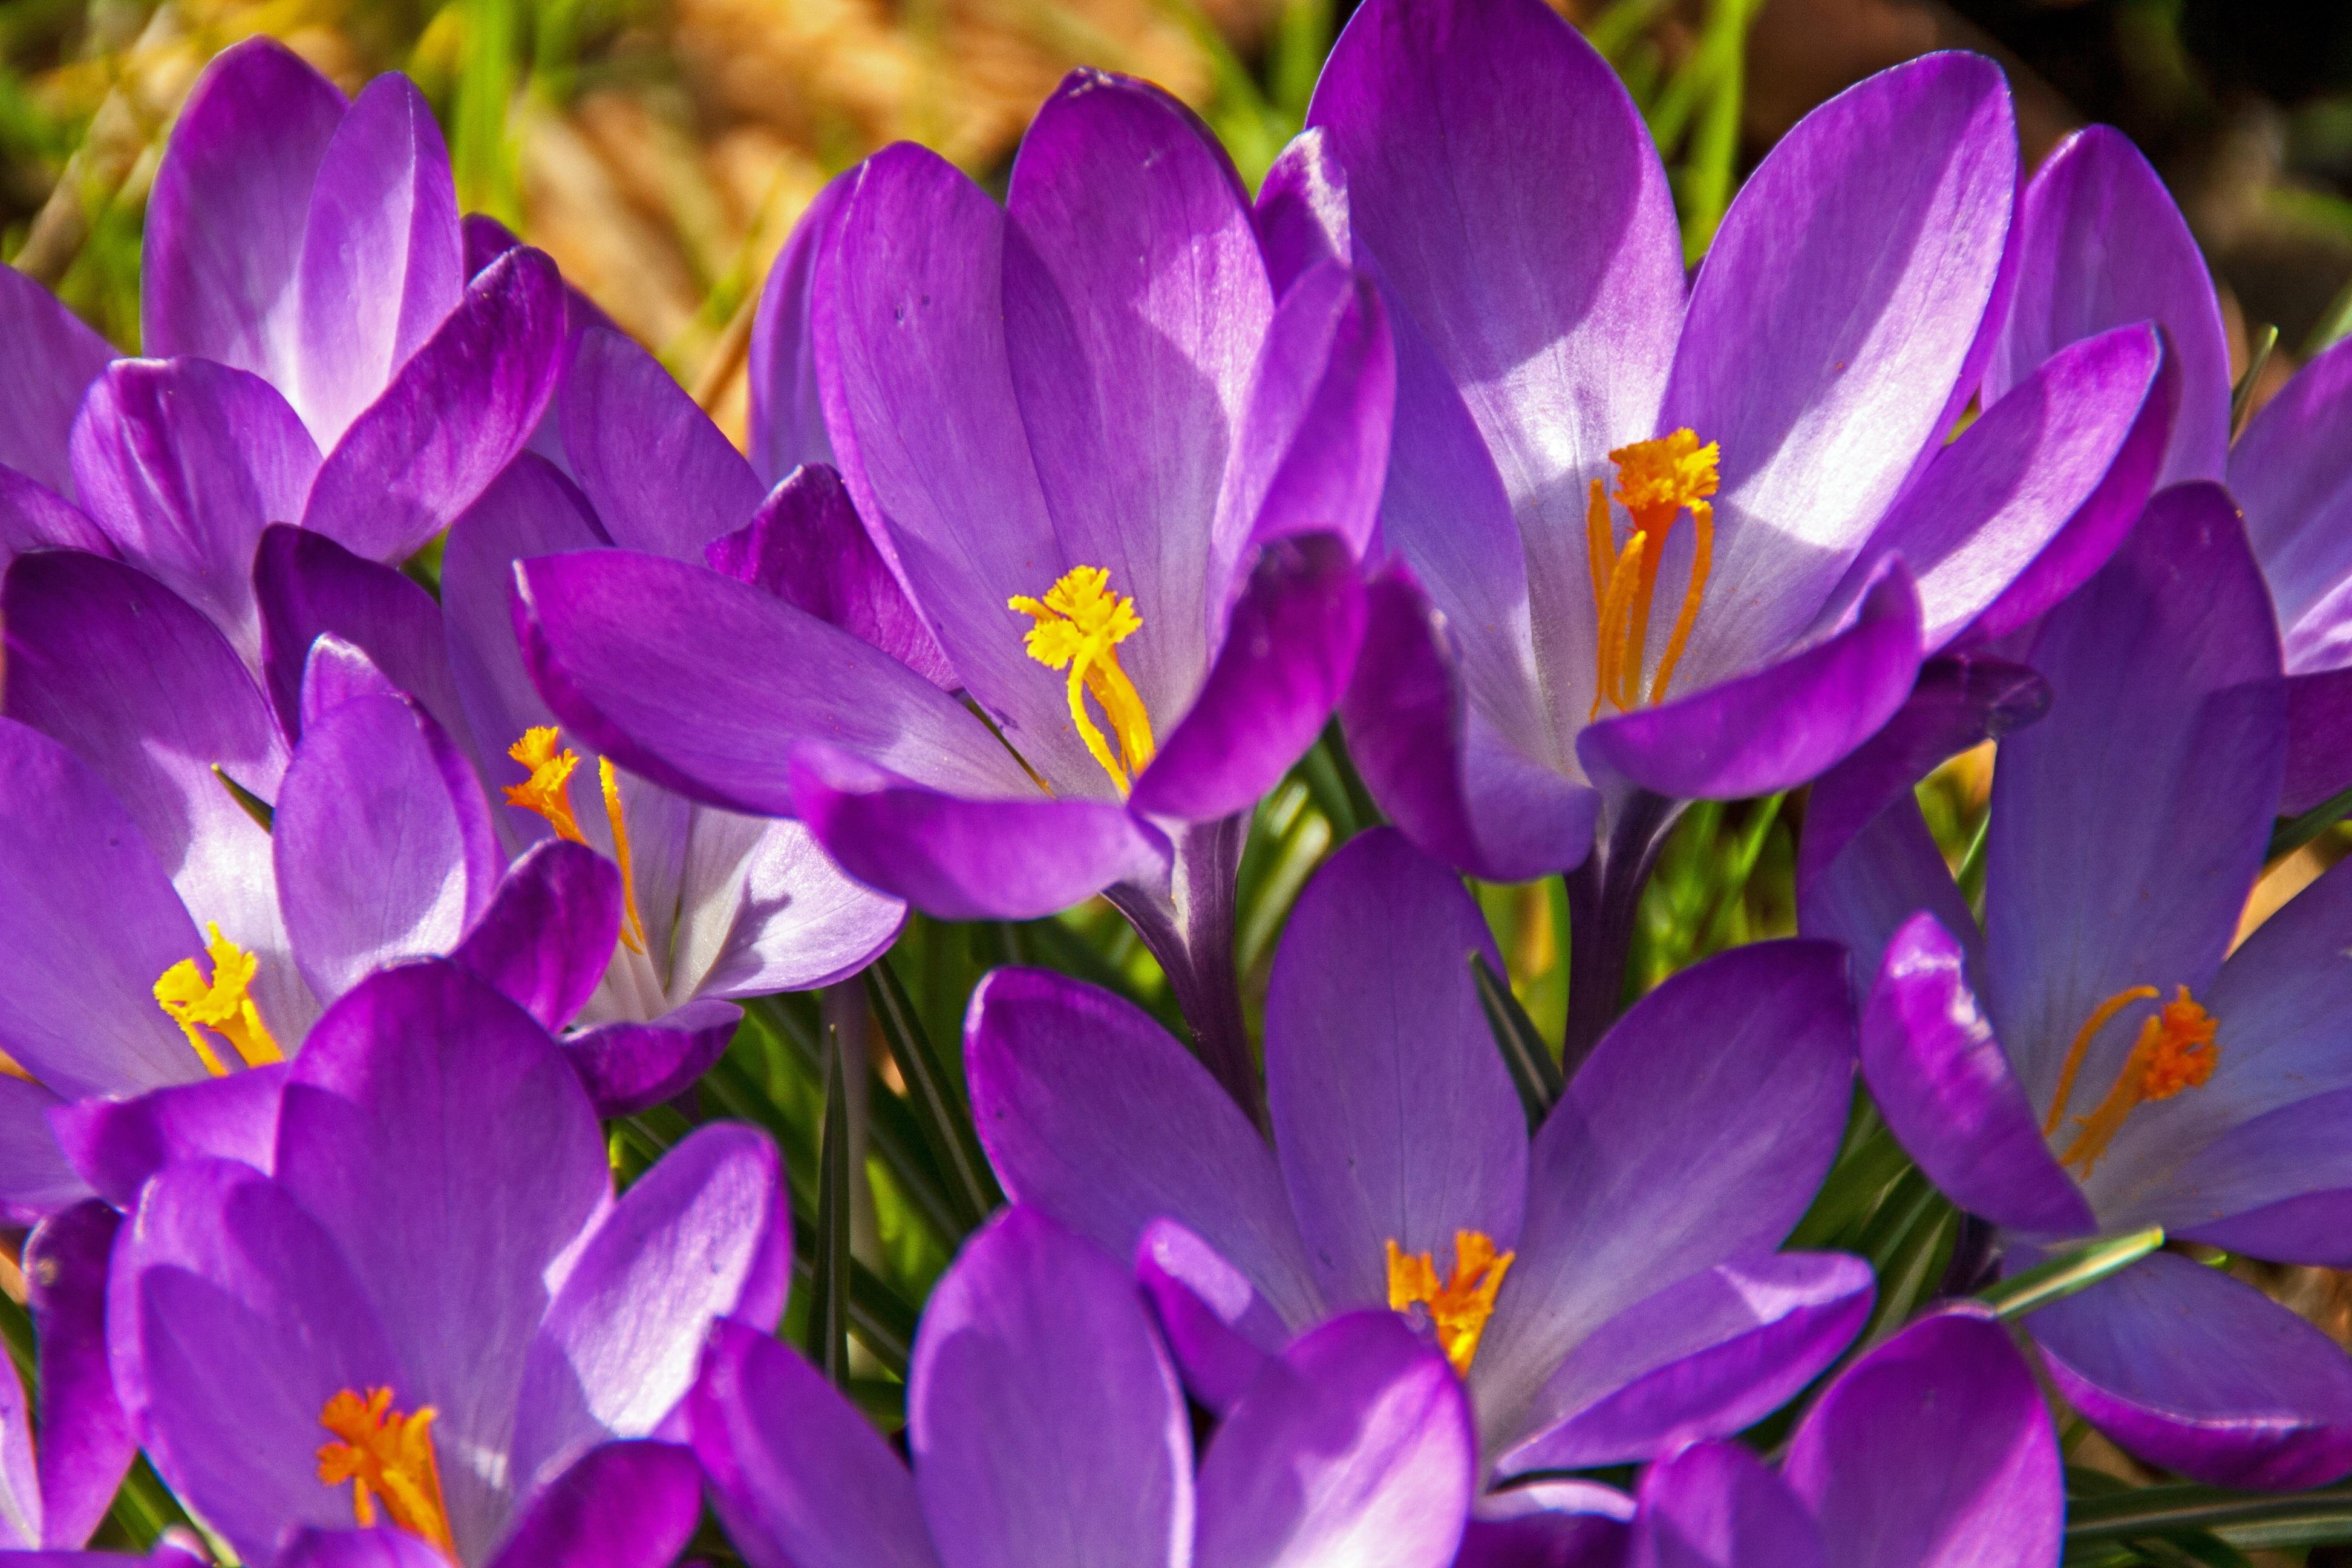 Free Images Nature Blossom Sun Petal Bloom Summer Allergy